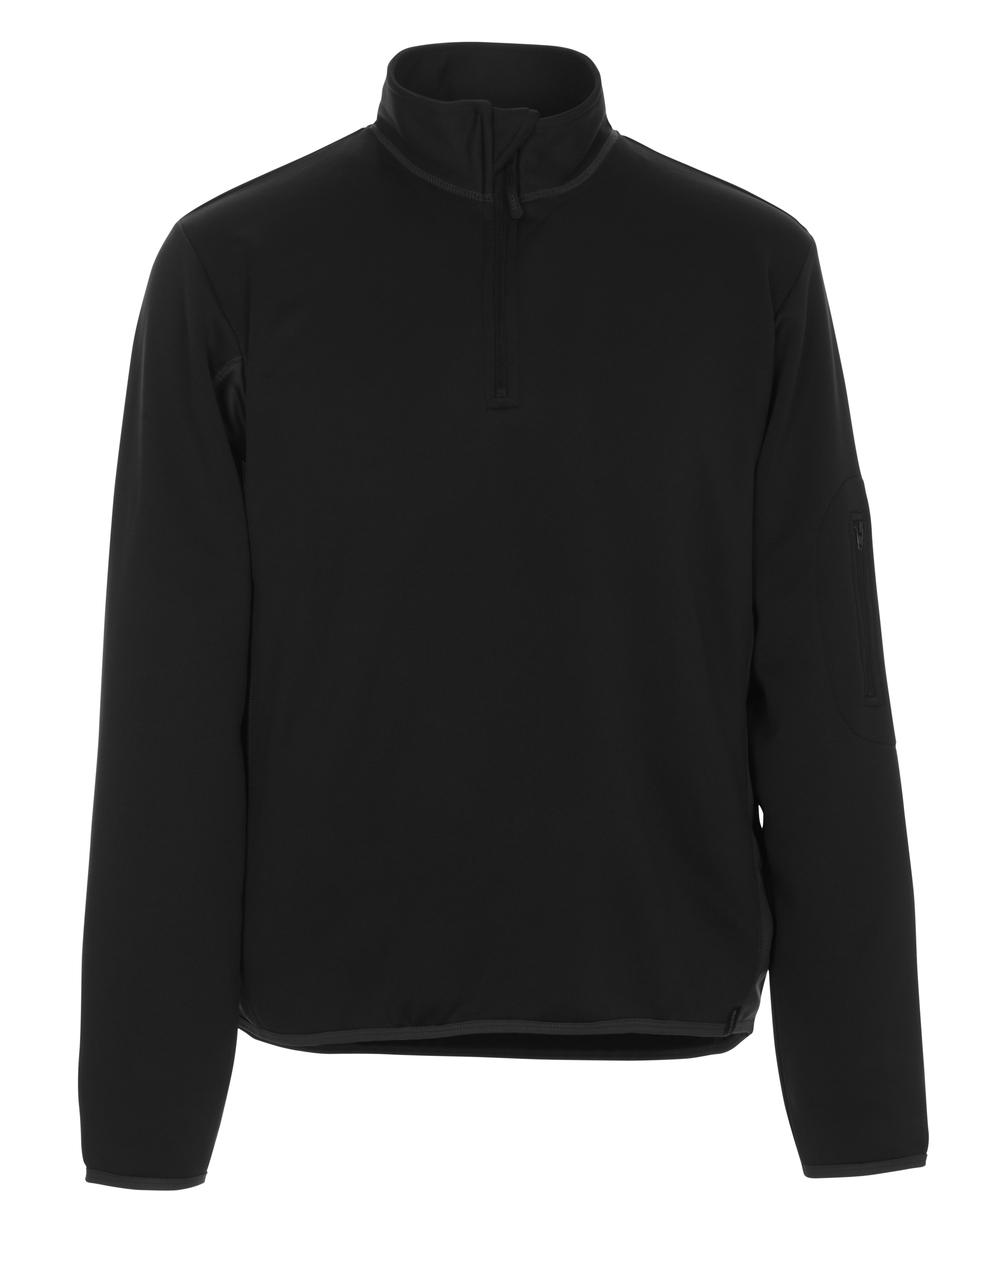 50068-828-0918 Polo-Sweatshirt - Schwarz/Dunkelanthrazit